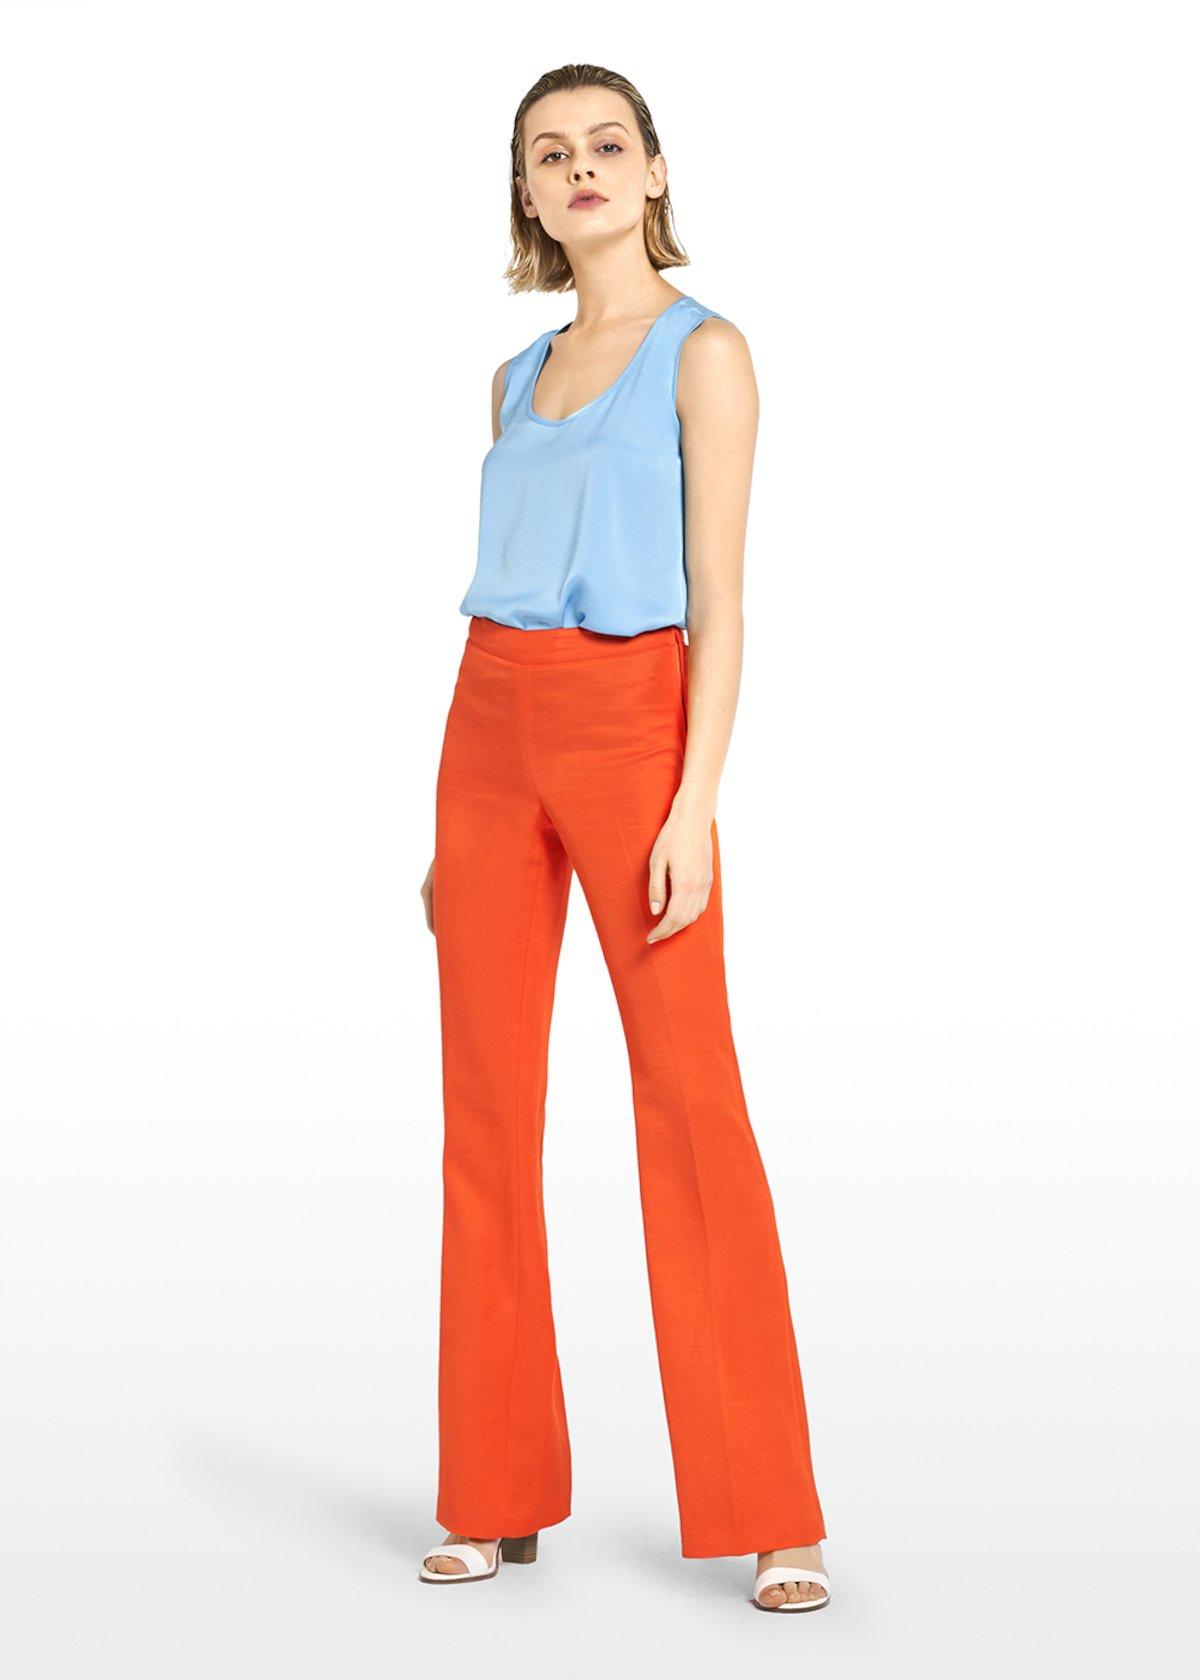 Plock flared trousers in linen - Mandarino - Woman - Category image